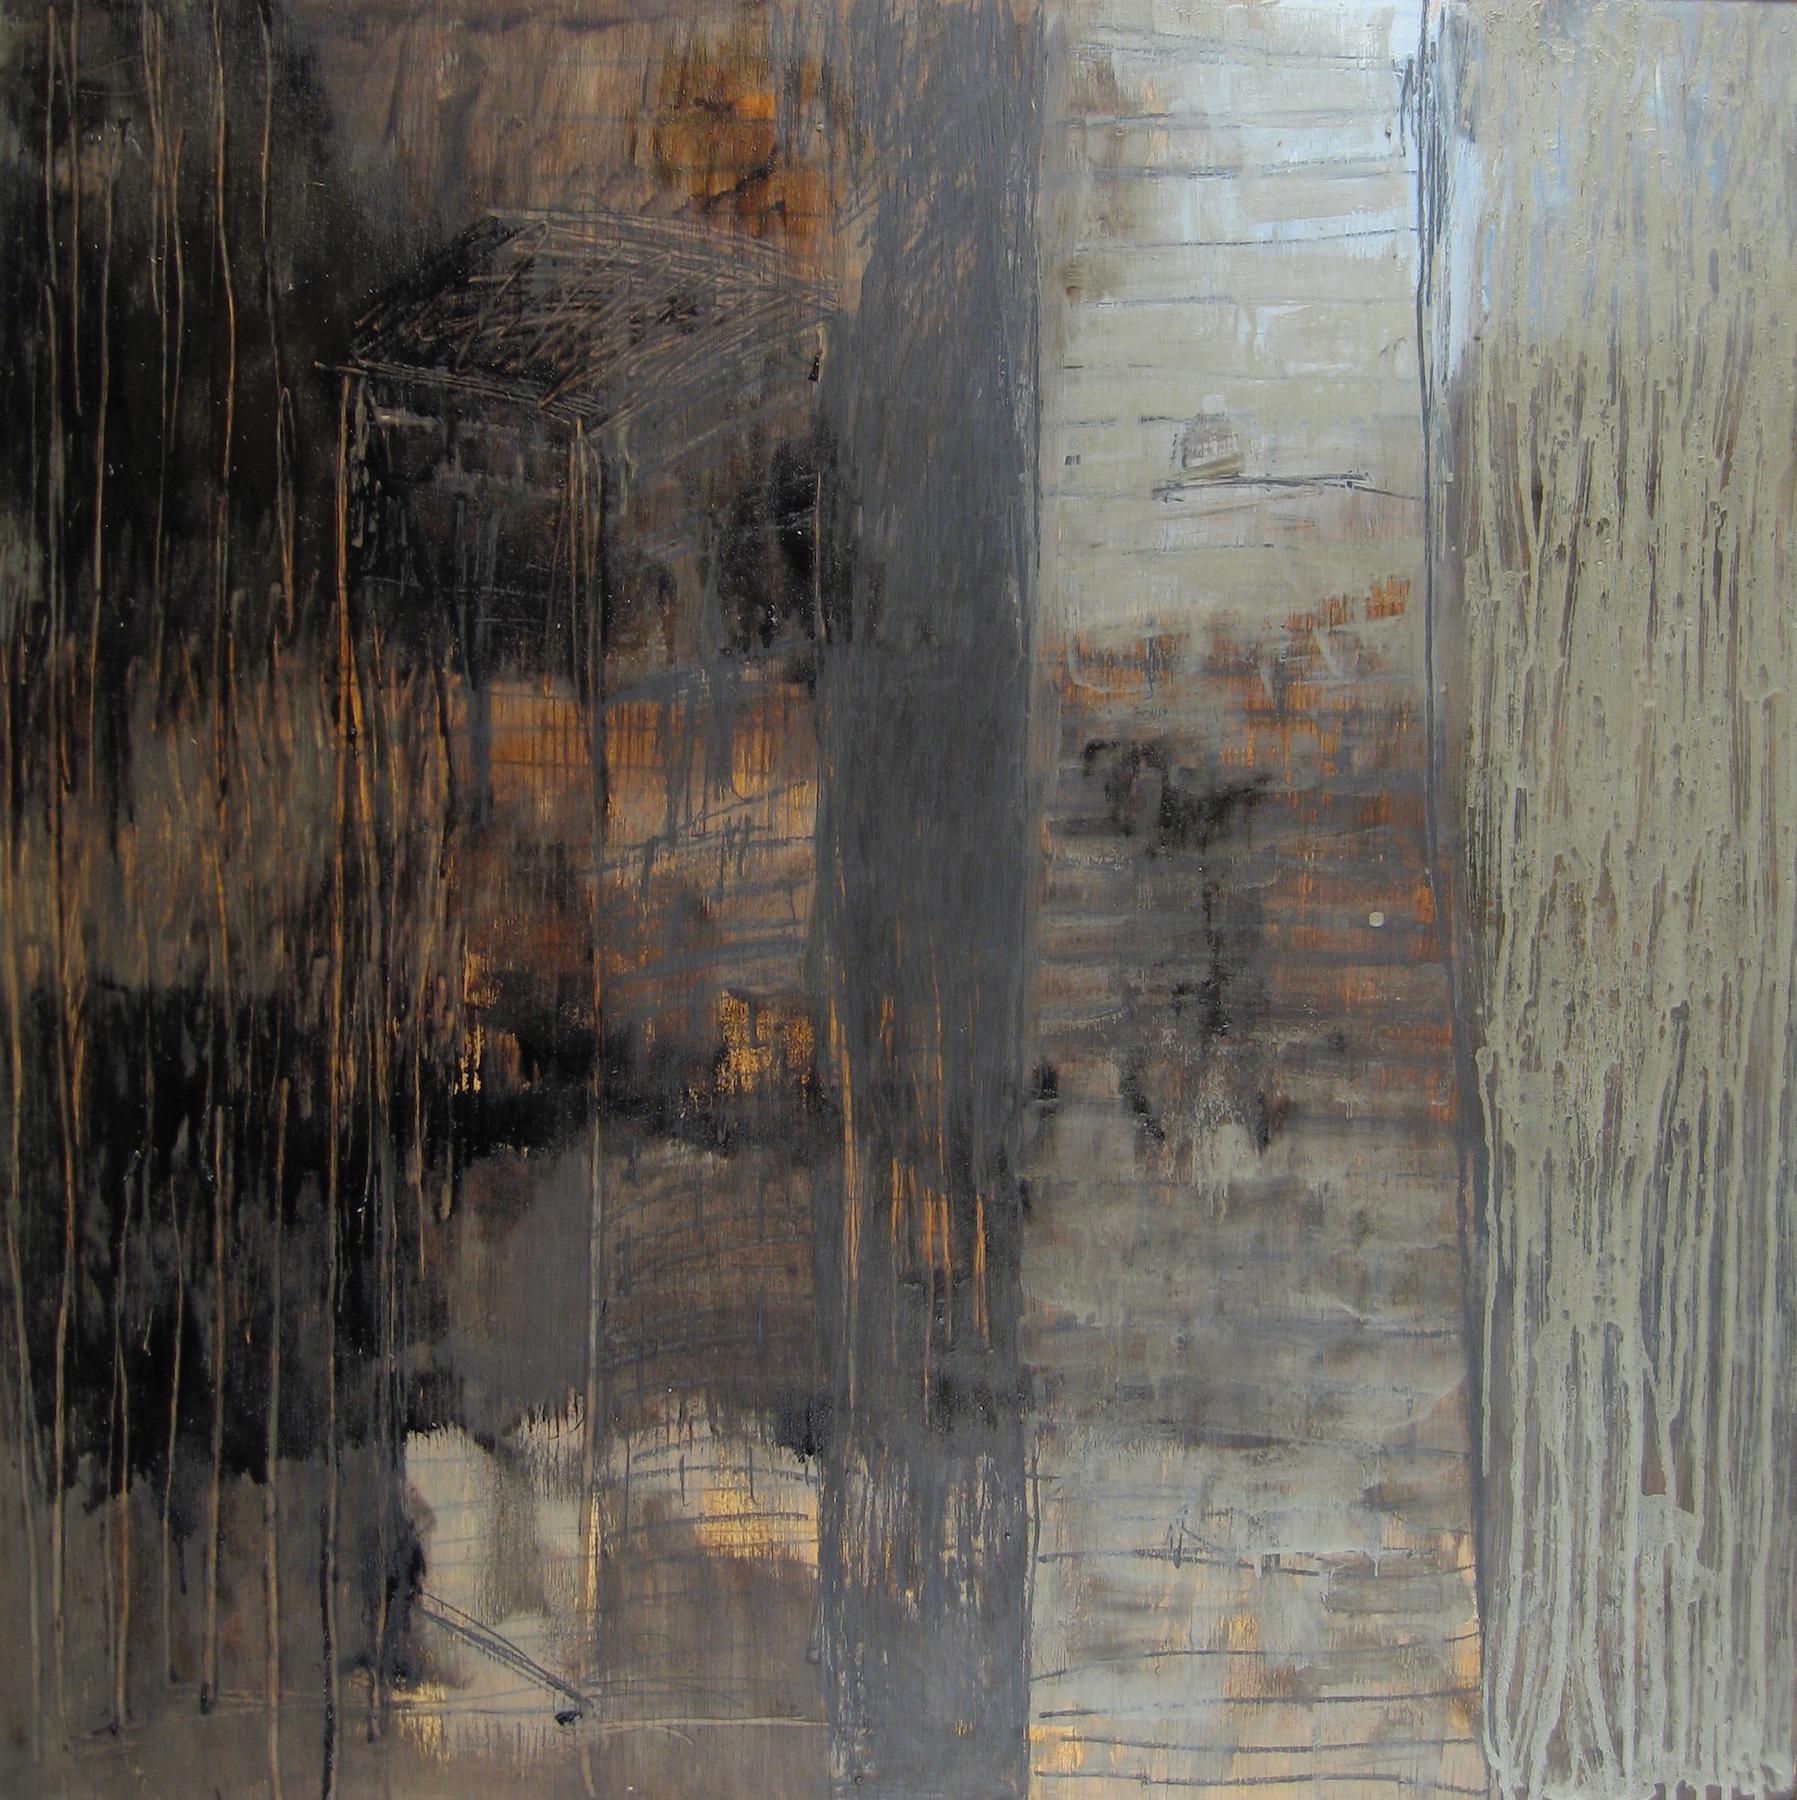 Leslie Zelamsky, Solace, mixed media, 30x30, $1,900